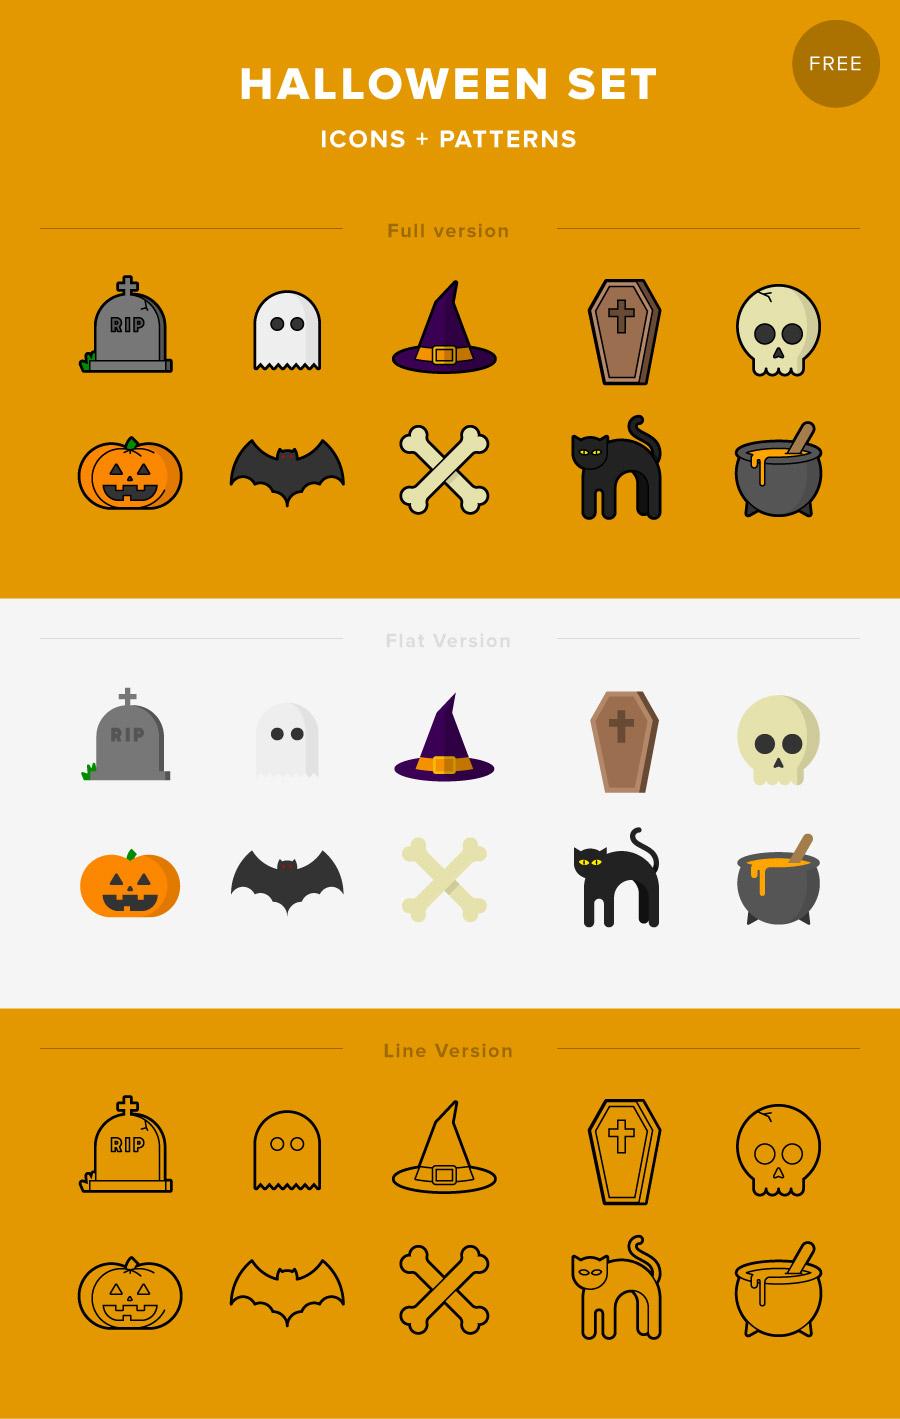 900x1419 Halloween Set (Icons + Patterns) Free Download